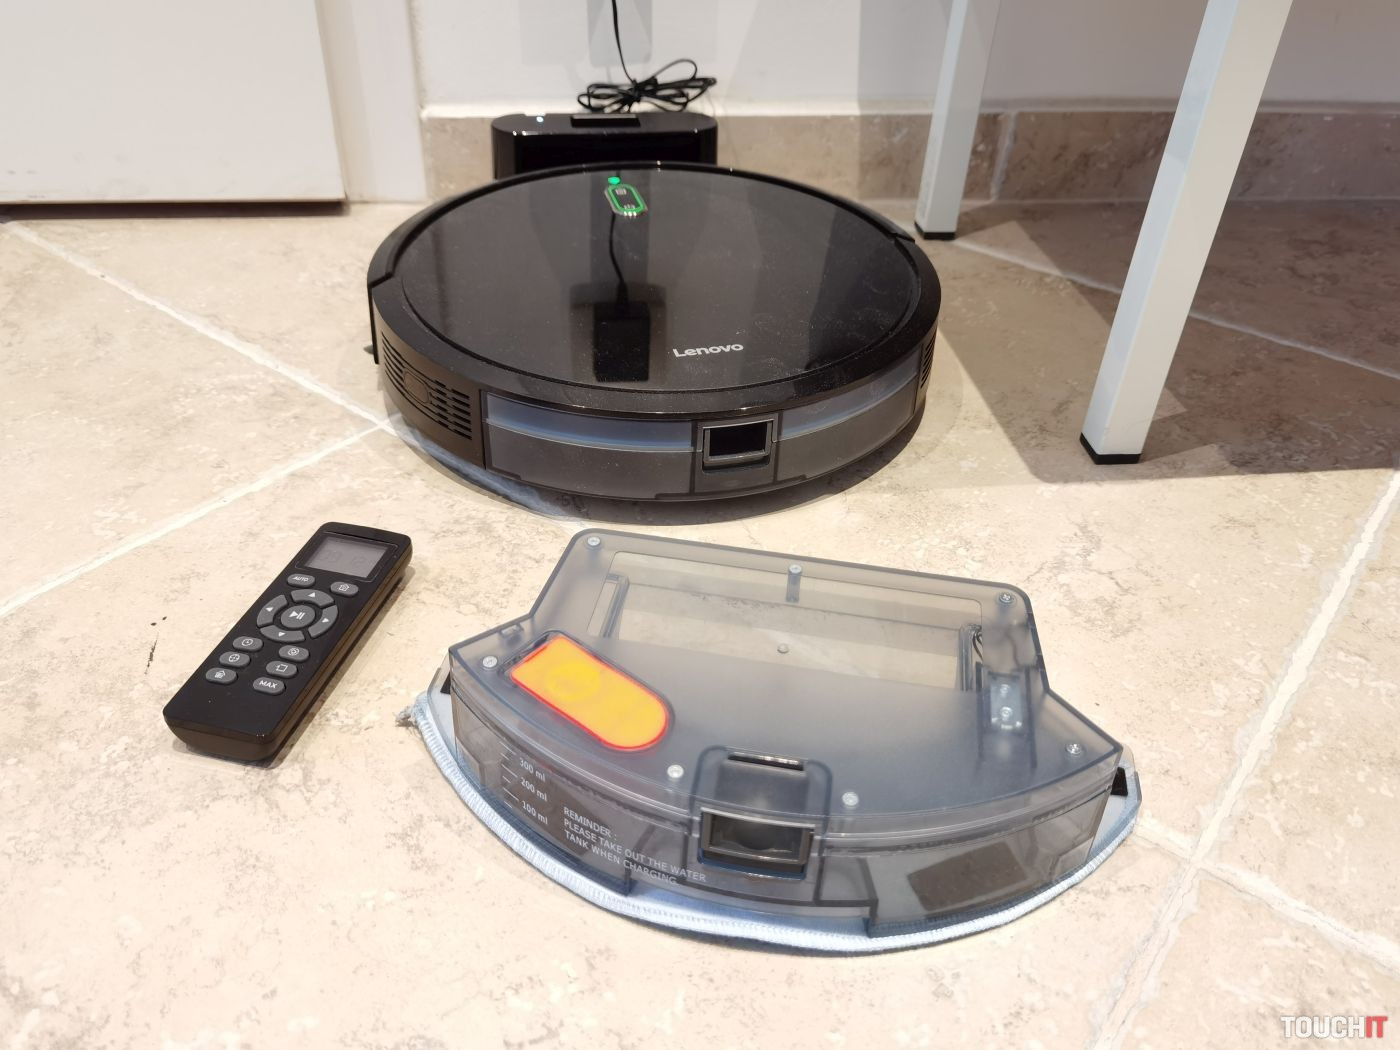 Lenovo E1 Vacuum Cleaner